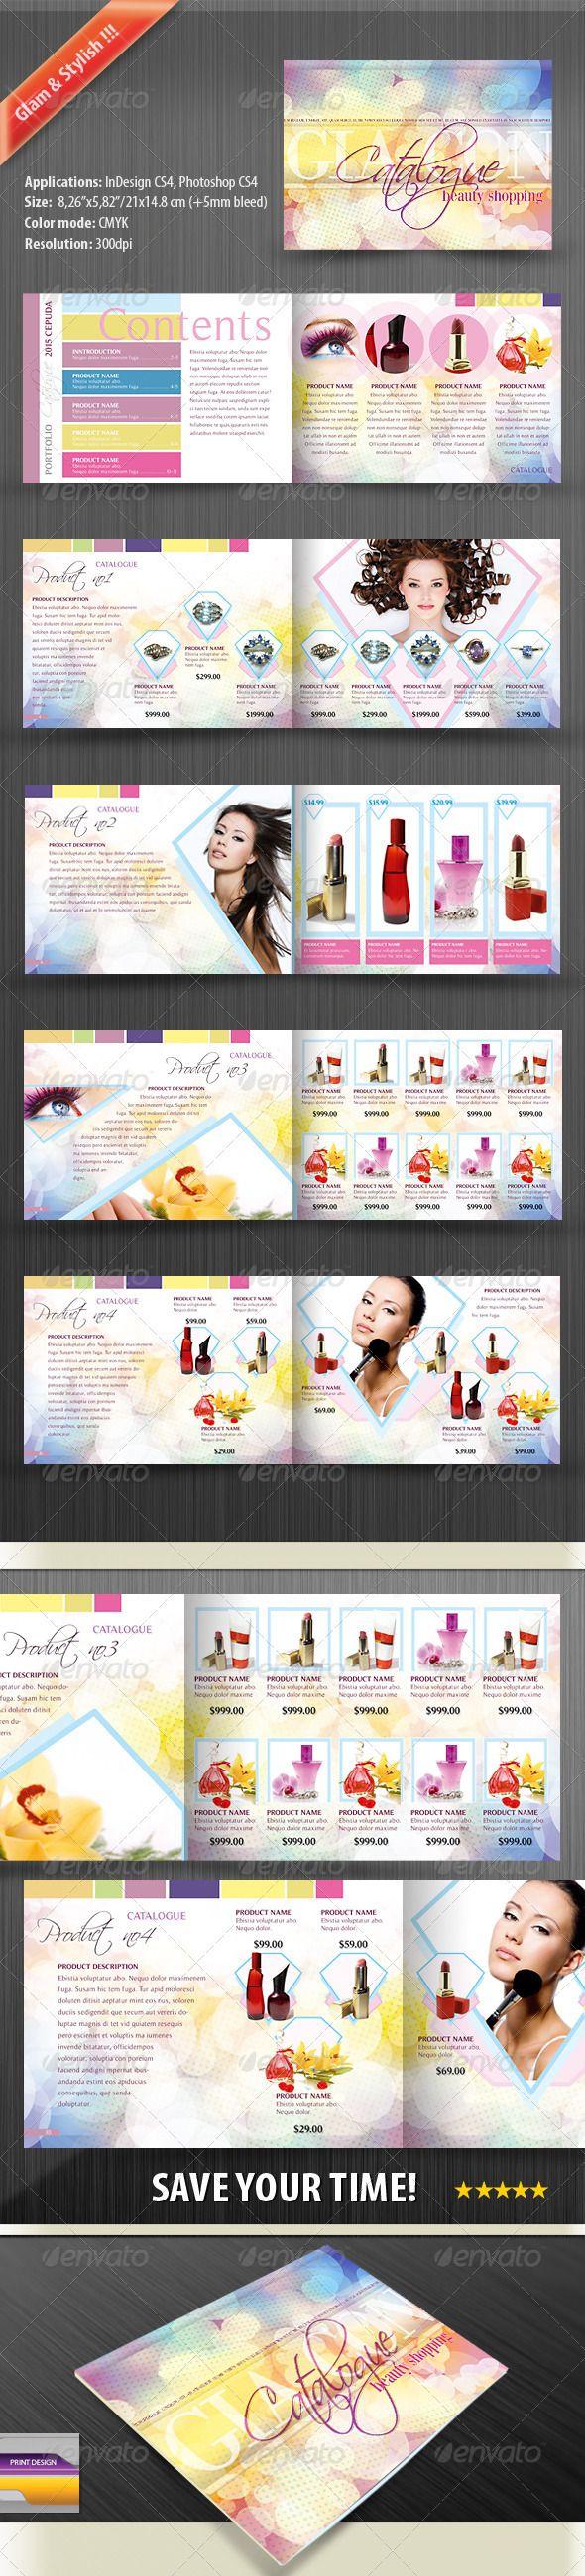 product catalog samples - Google Search | Catalog Inspiration ...